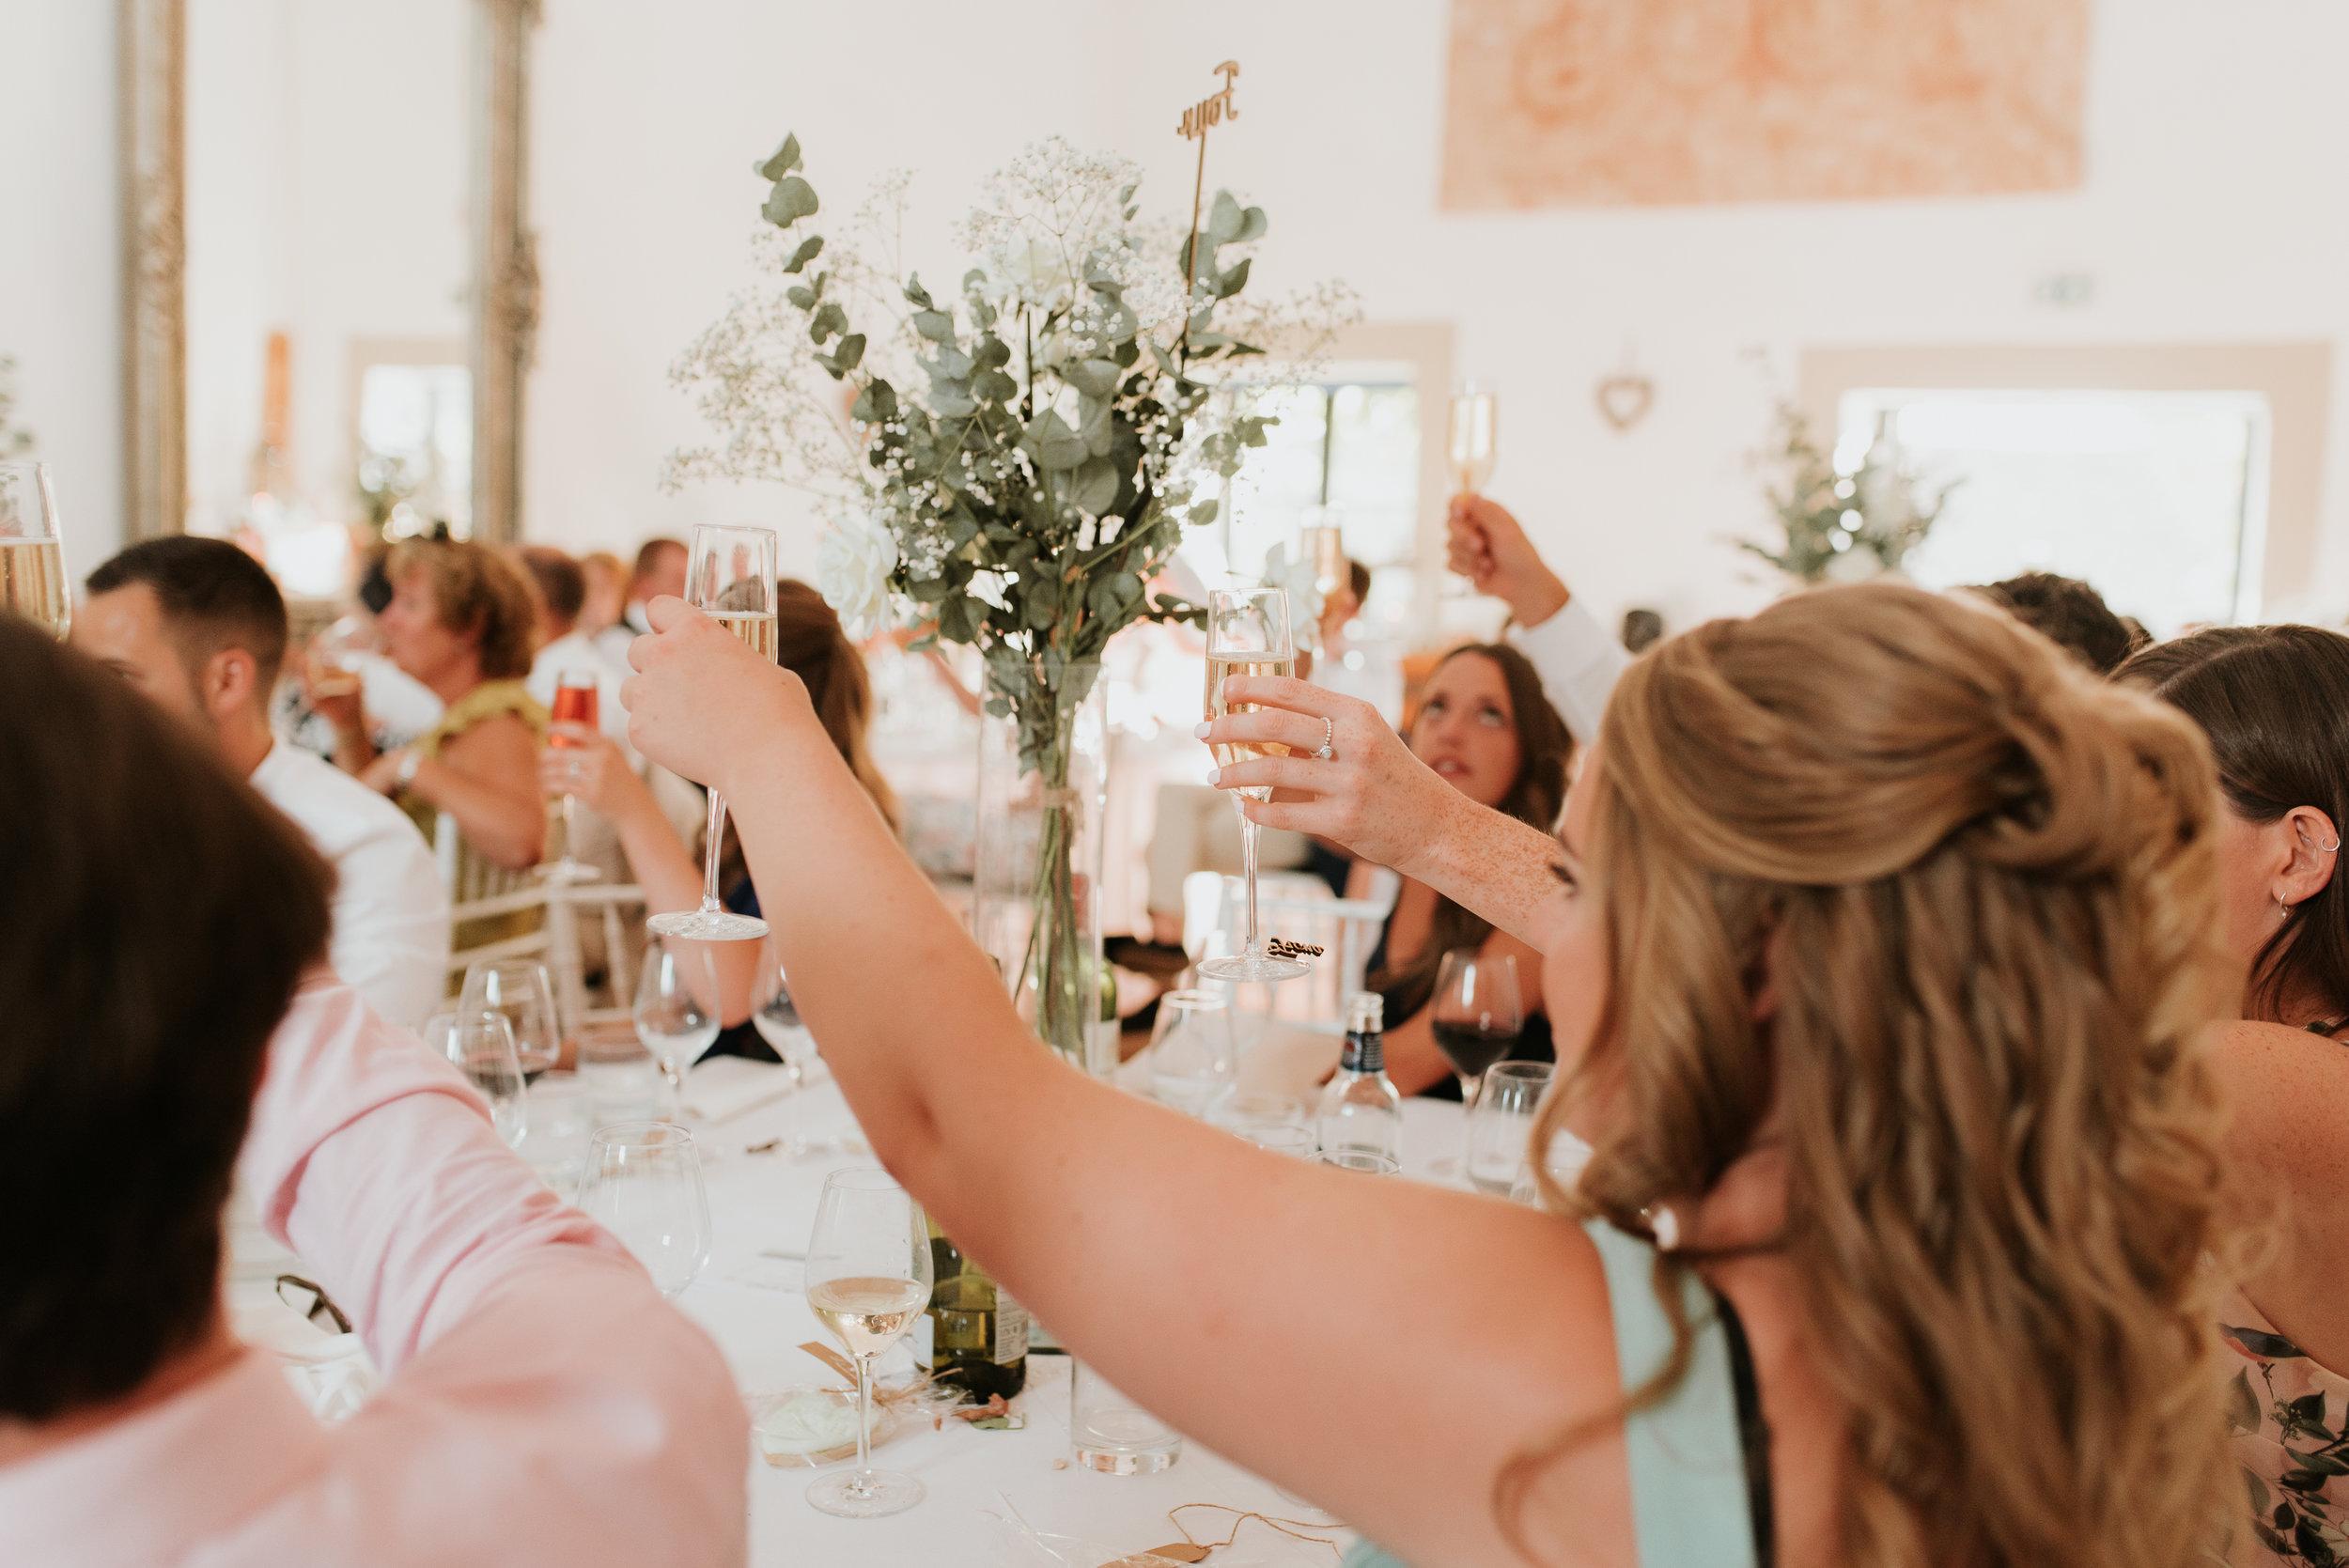 Oxfordshire-wedding-photographer-68.jpg